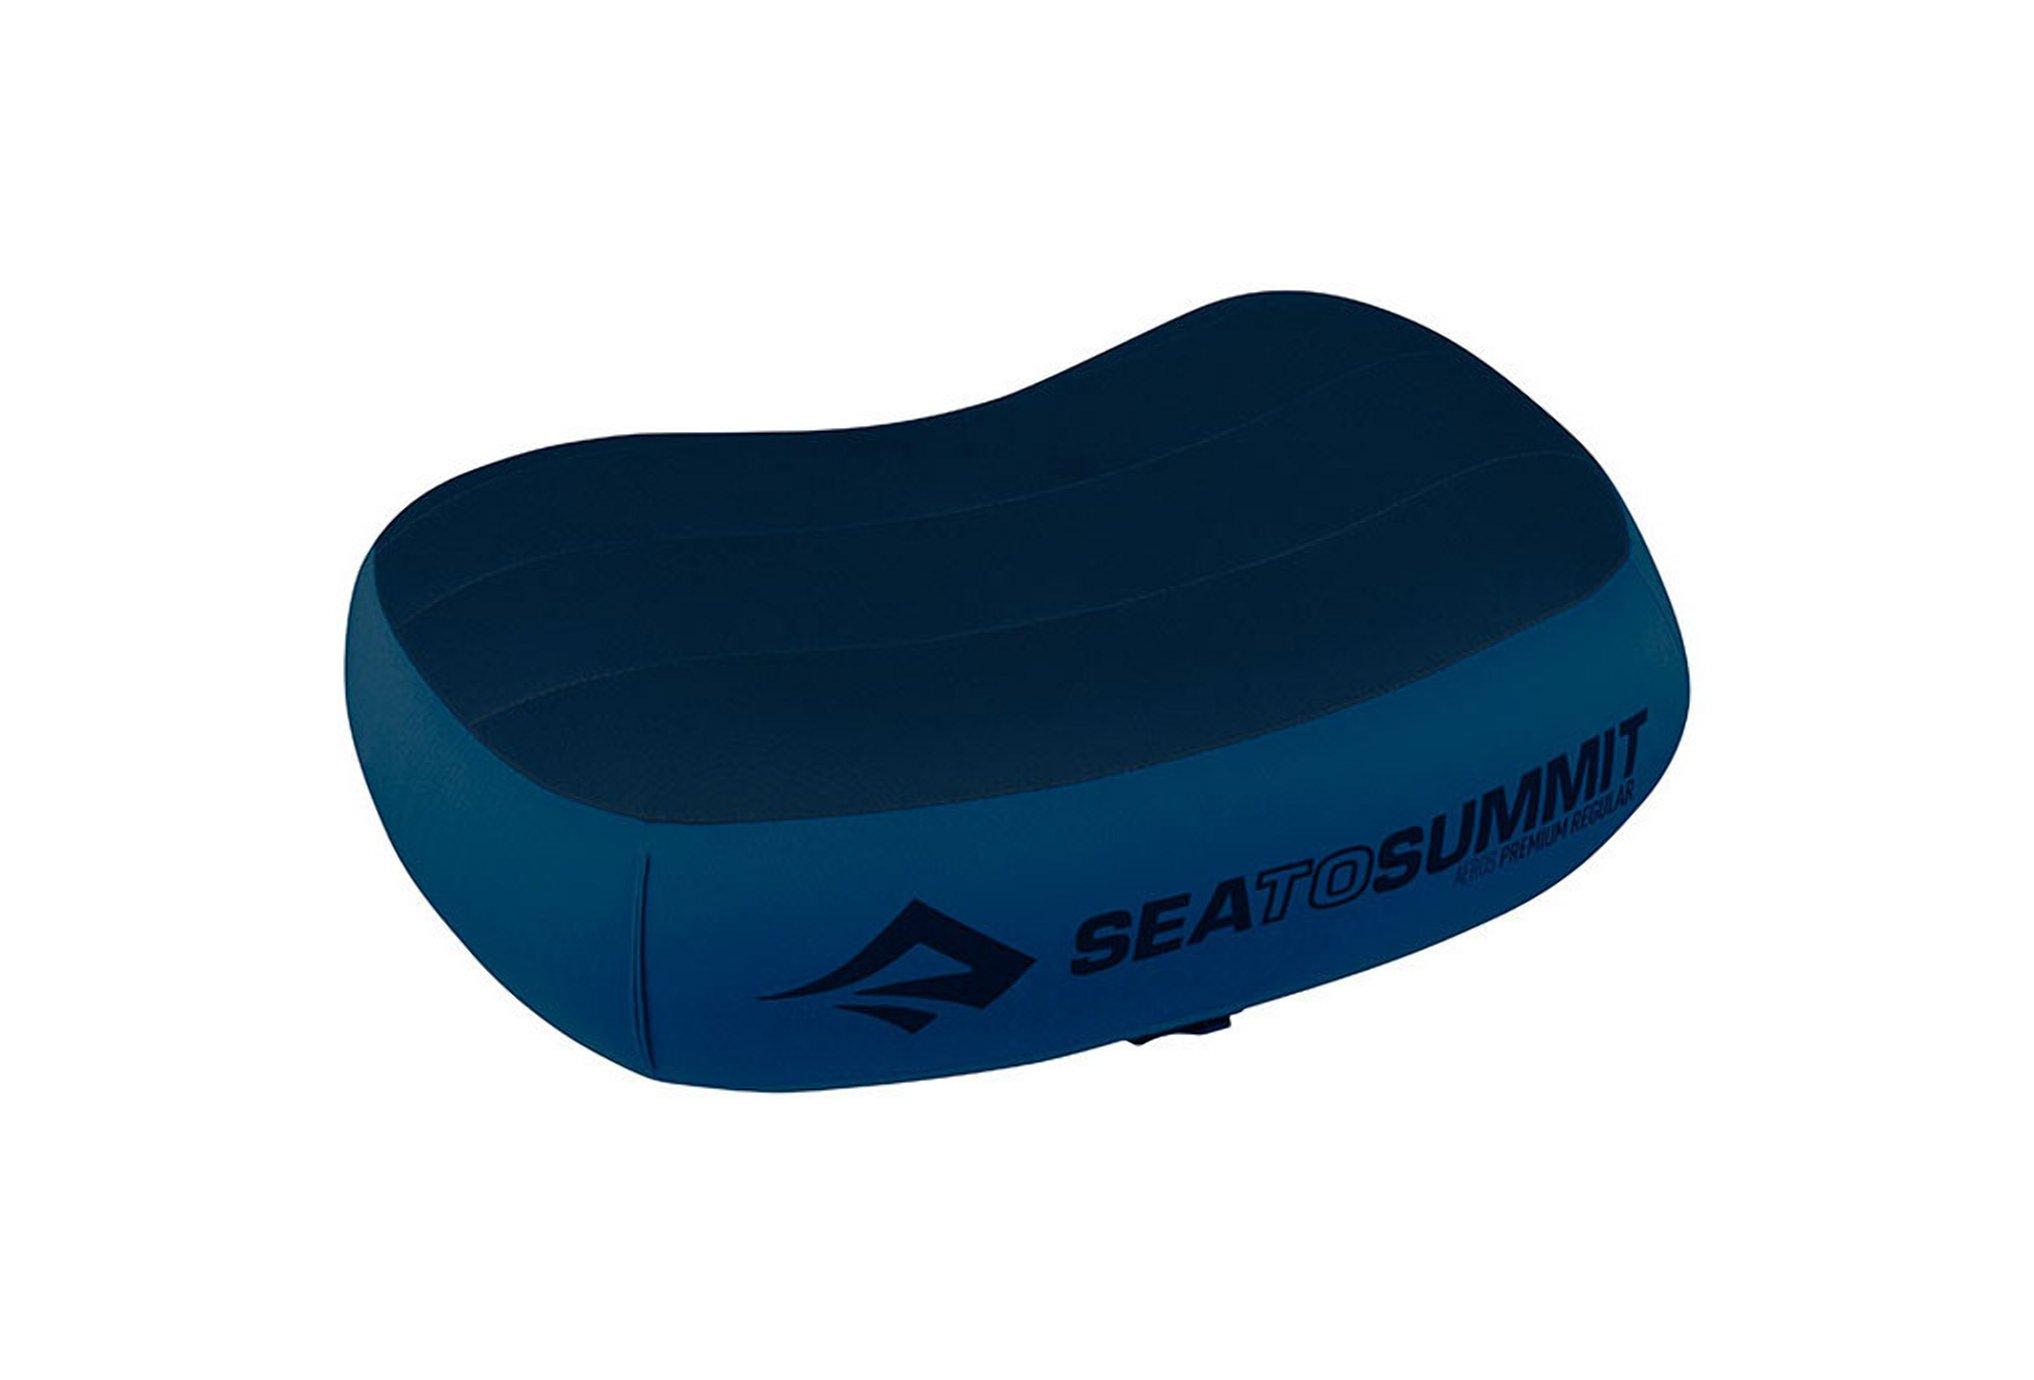 Sea To Summit Oreiller gonflable Aero Premium - R Bivouac